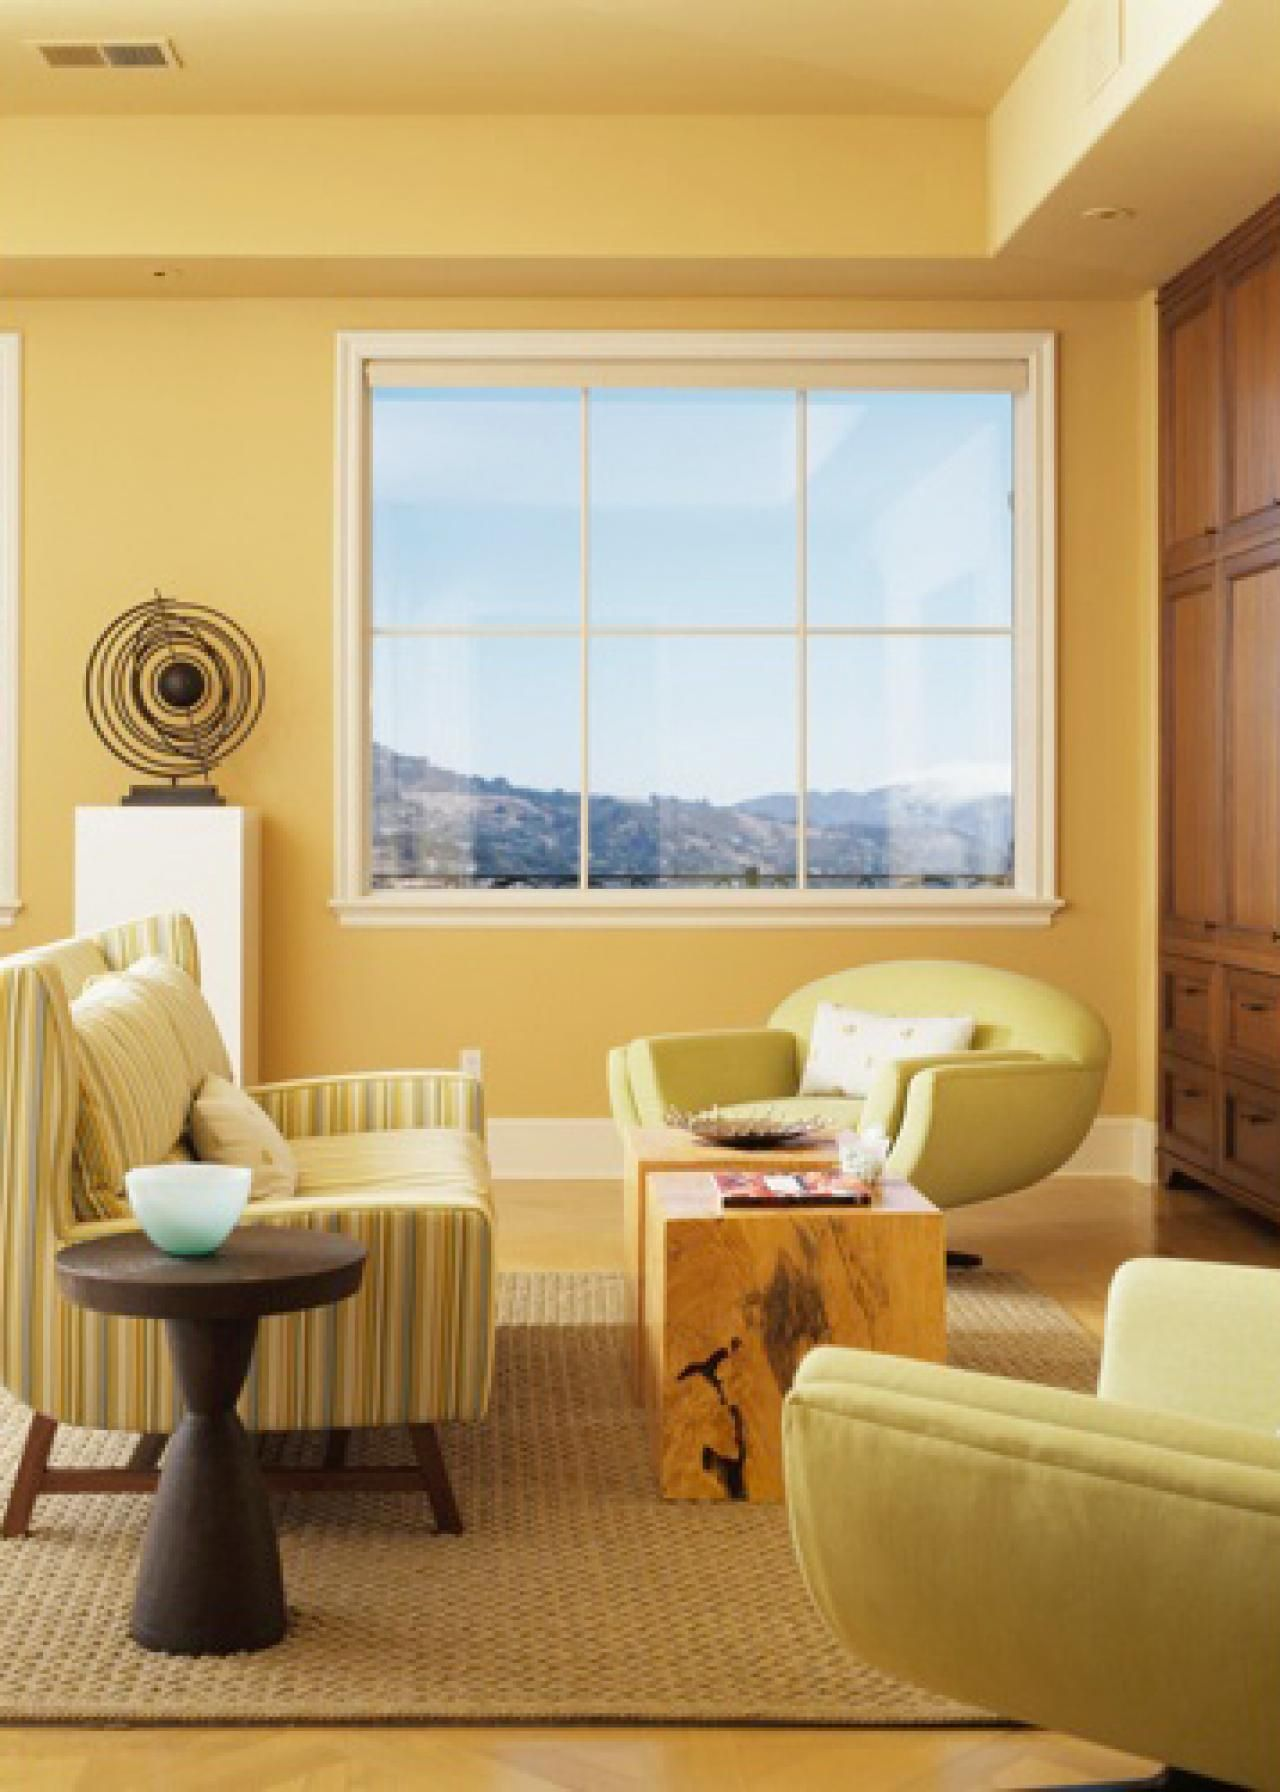 Millerstevenyellowlivingroomrendhgtvcom12801792 Unique Yellow Living Room Chairs Design Inspiration